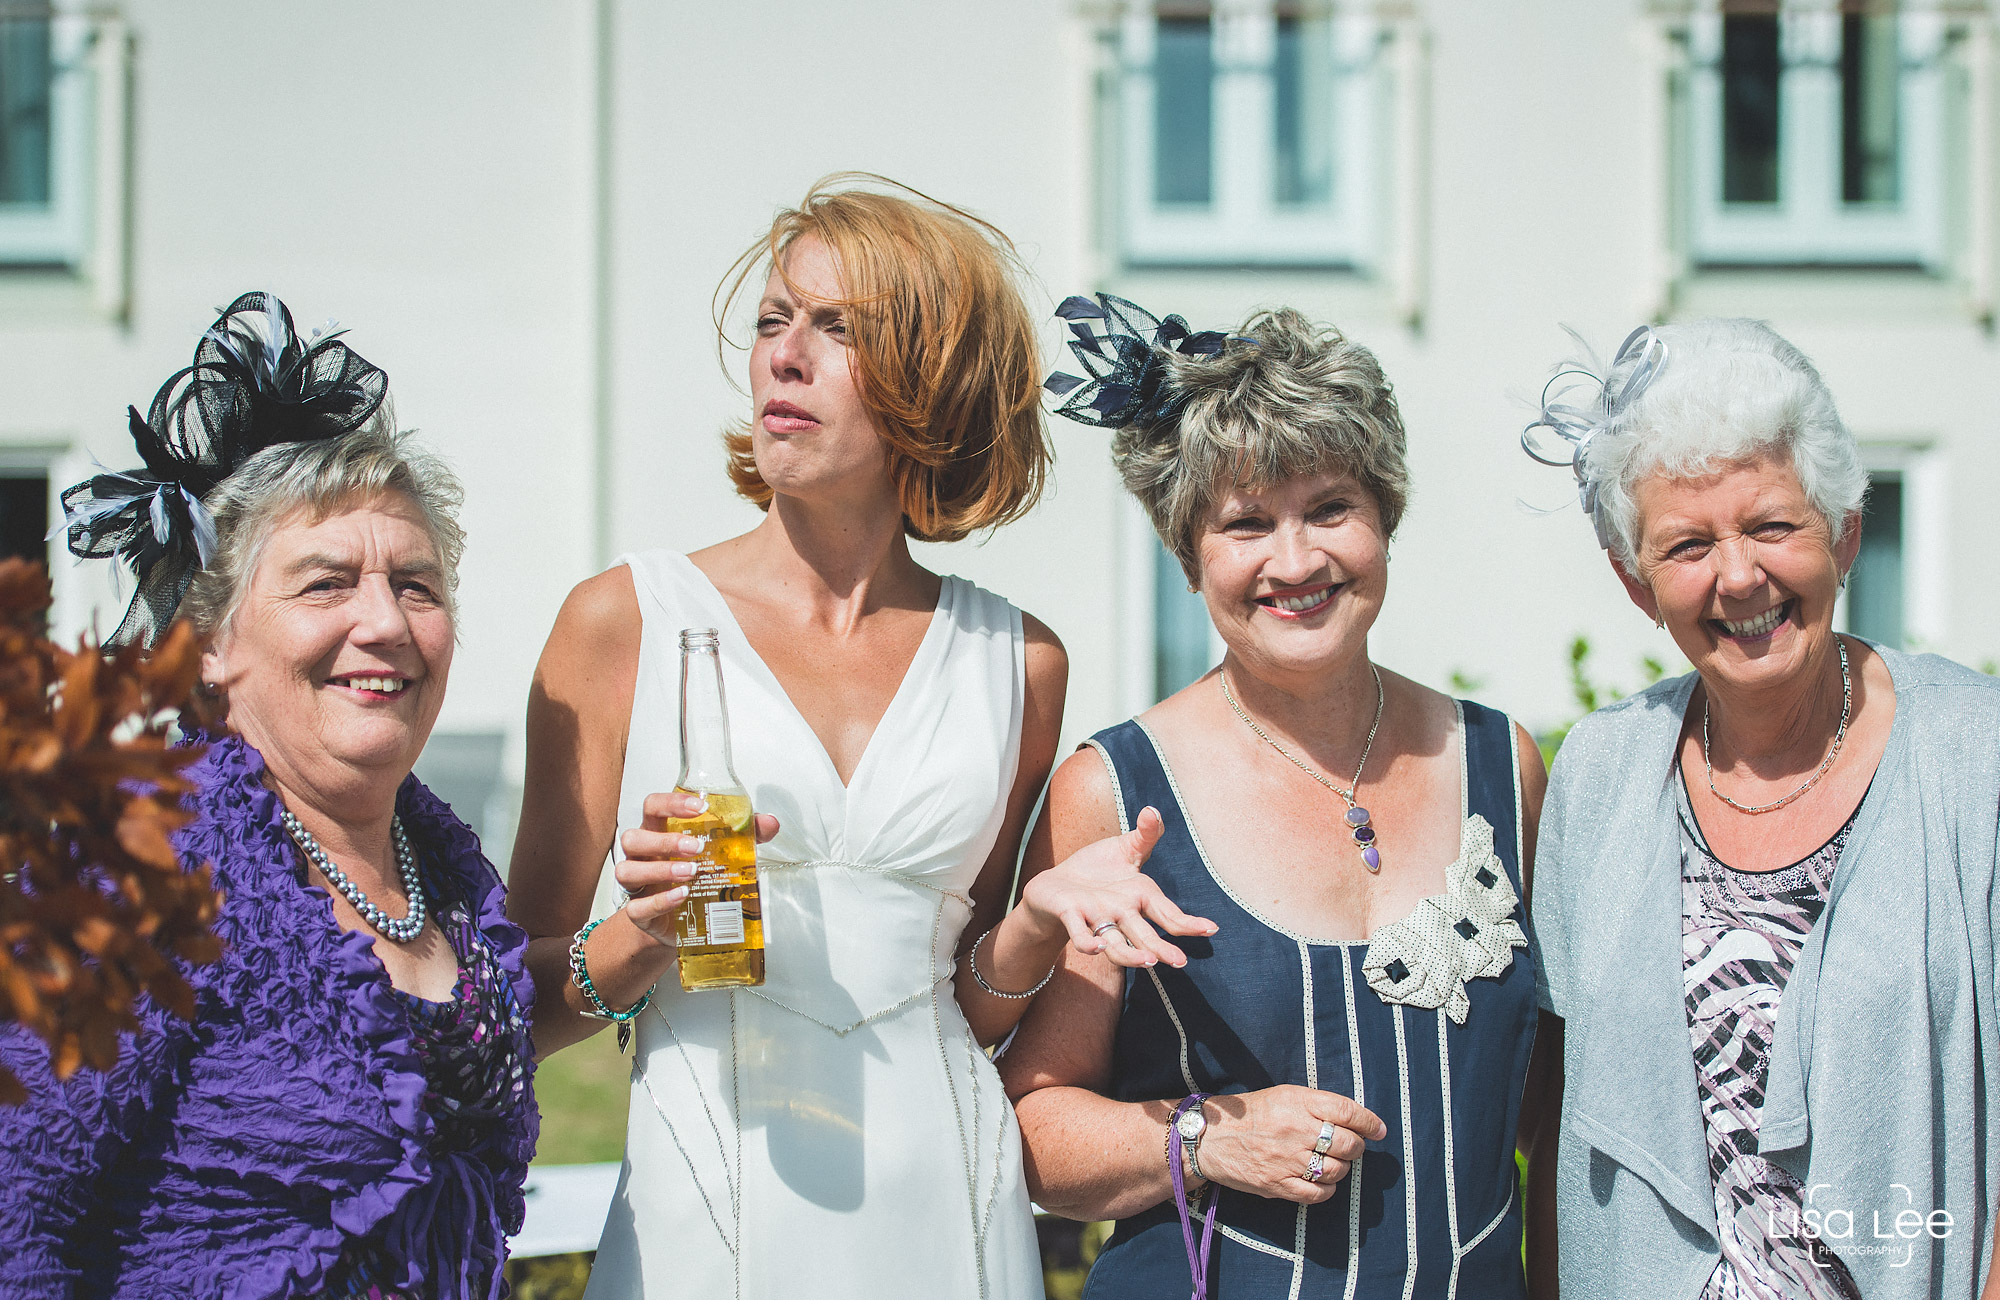 lisa-lee-wedding-photography-christchurch-dorset-bride5.jpg